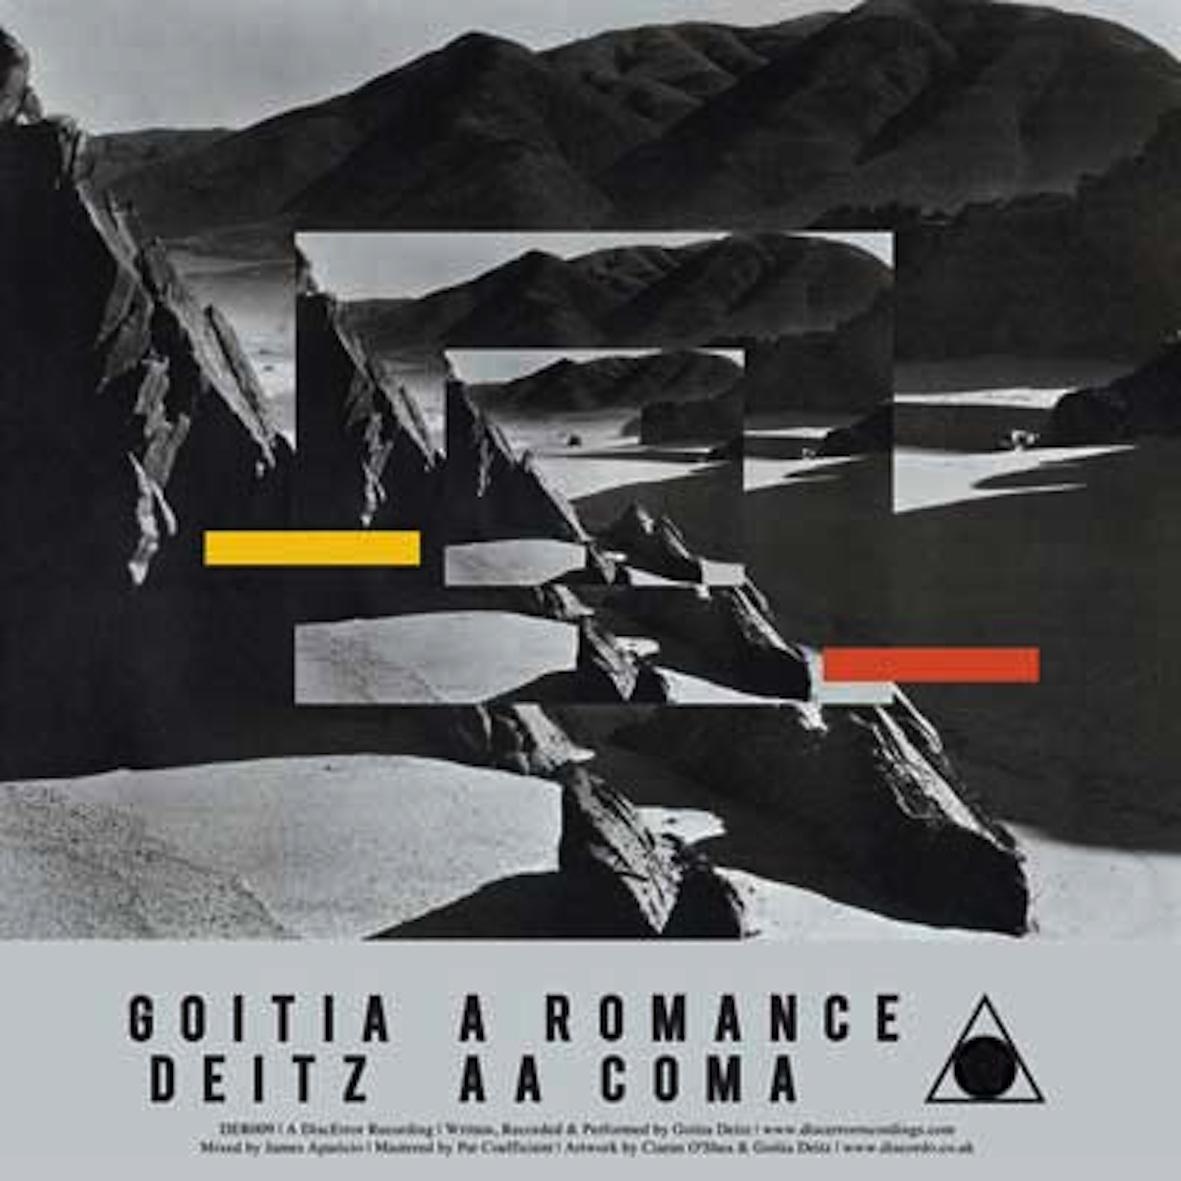 Tracks, Under The Radar, Test Pressing, Dr Rob, Goitia Deitz, Romance, Disc Error